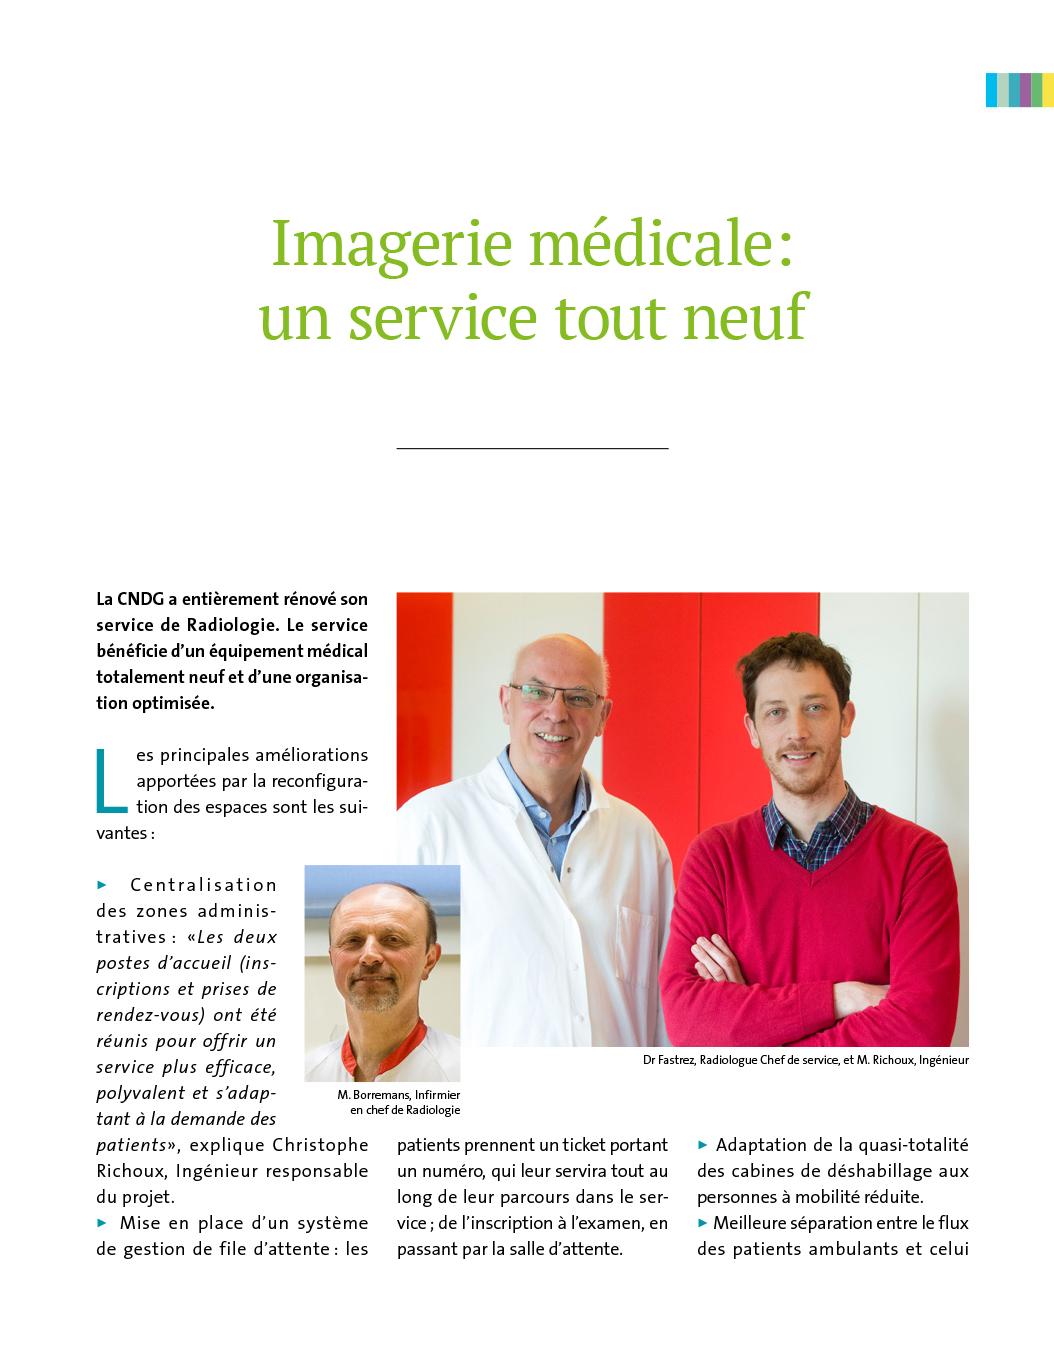 cndg_rapportactivites_2015_extrait_radiologie-1